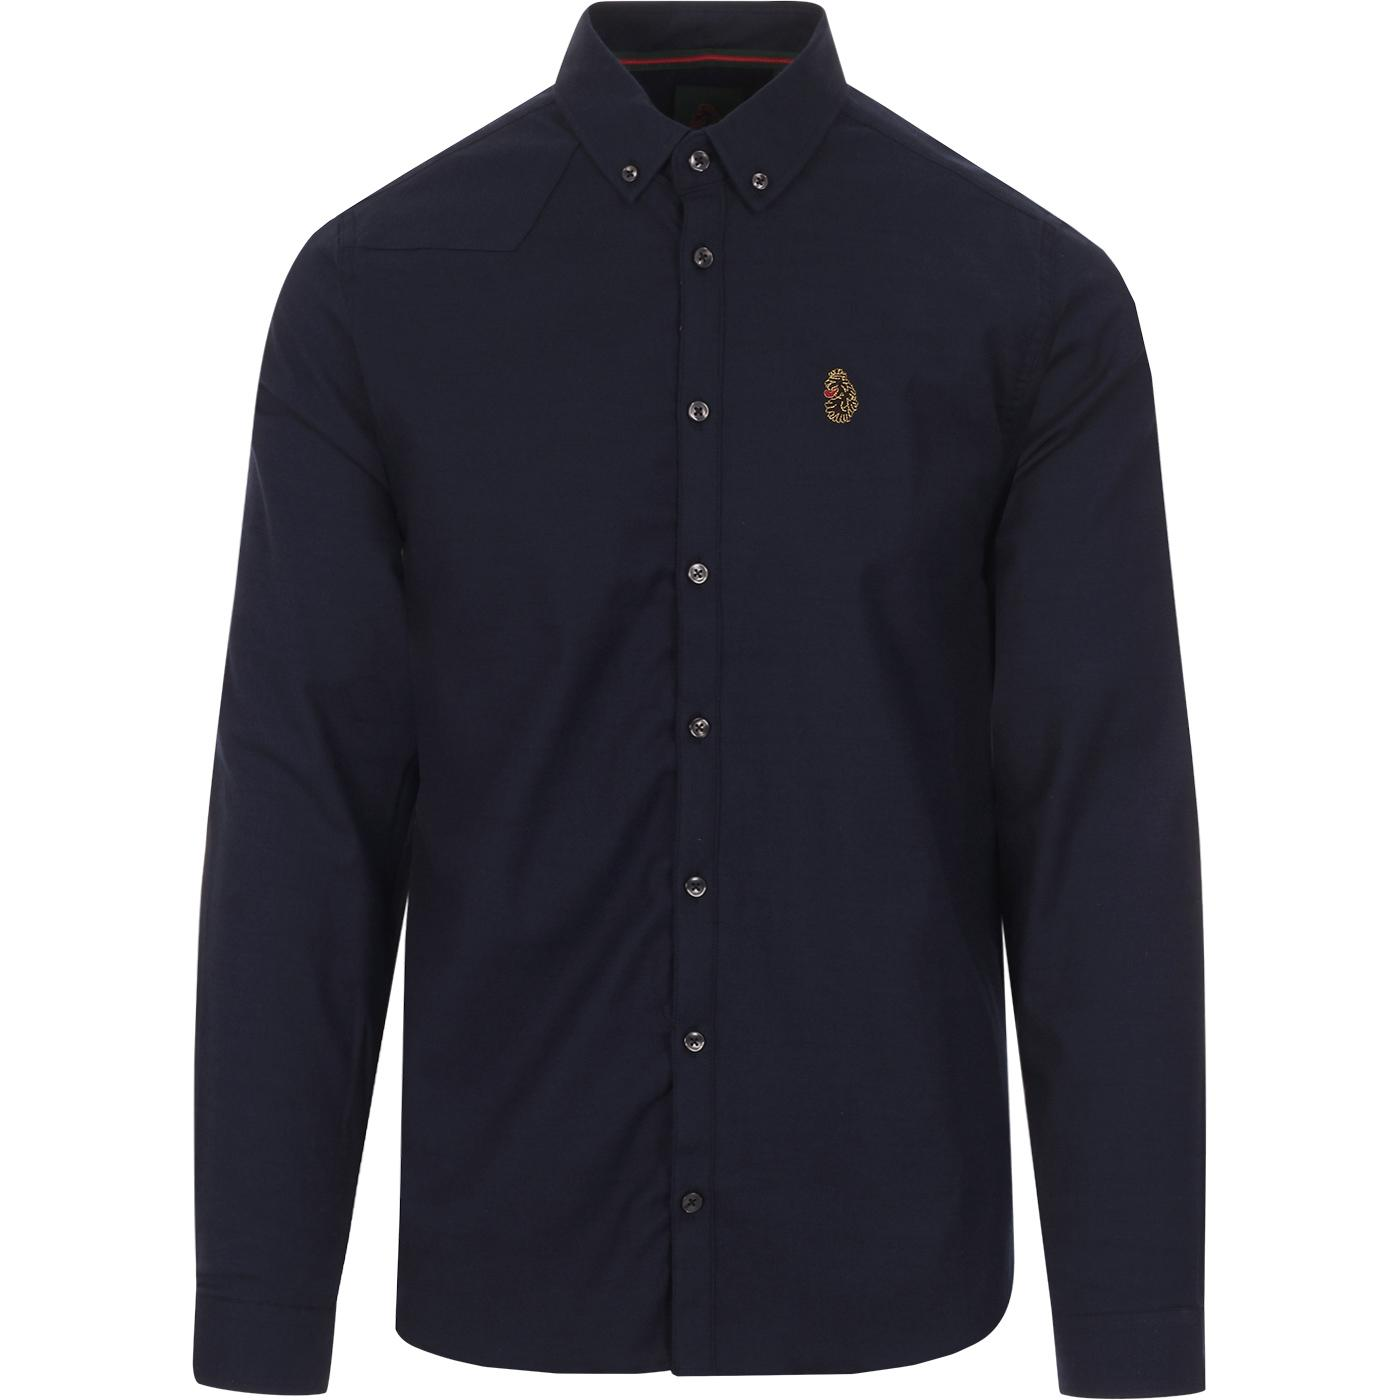 Cuftwill LUKE Mod Tailored Fit Button Down Shirt